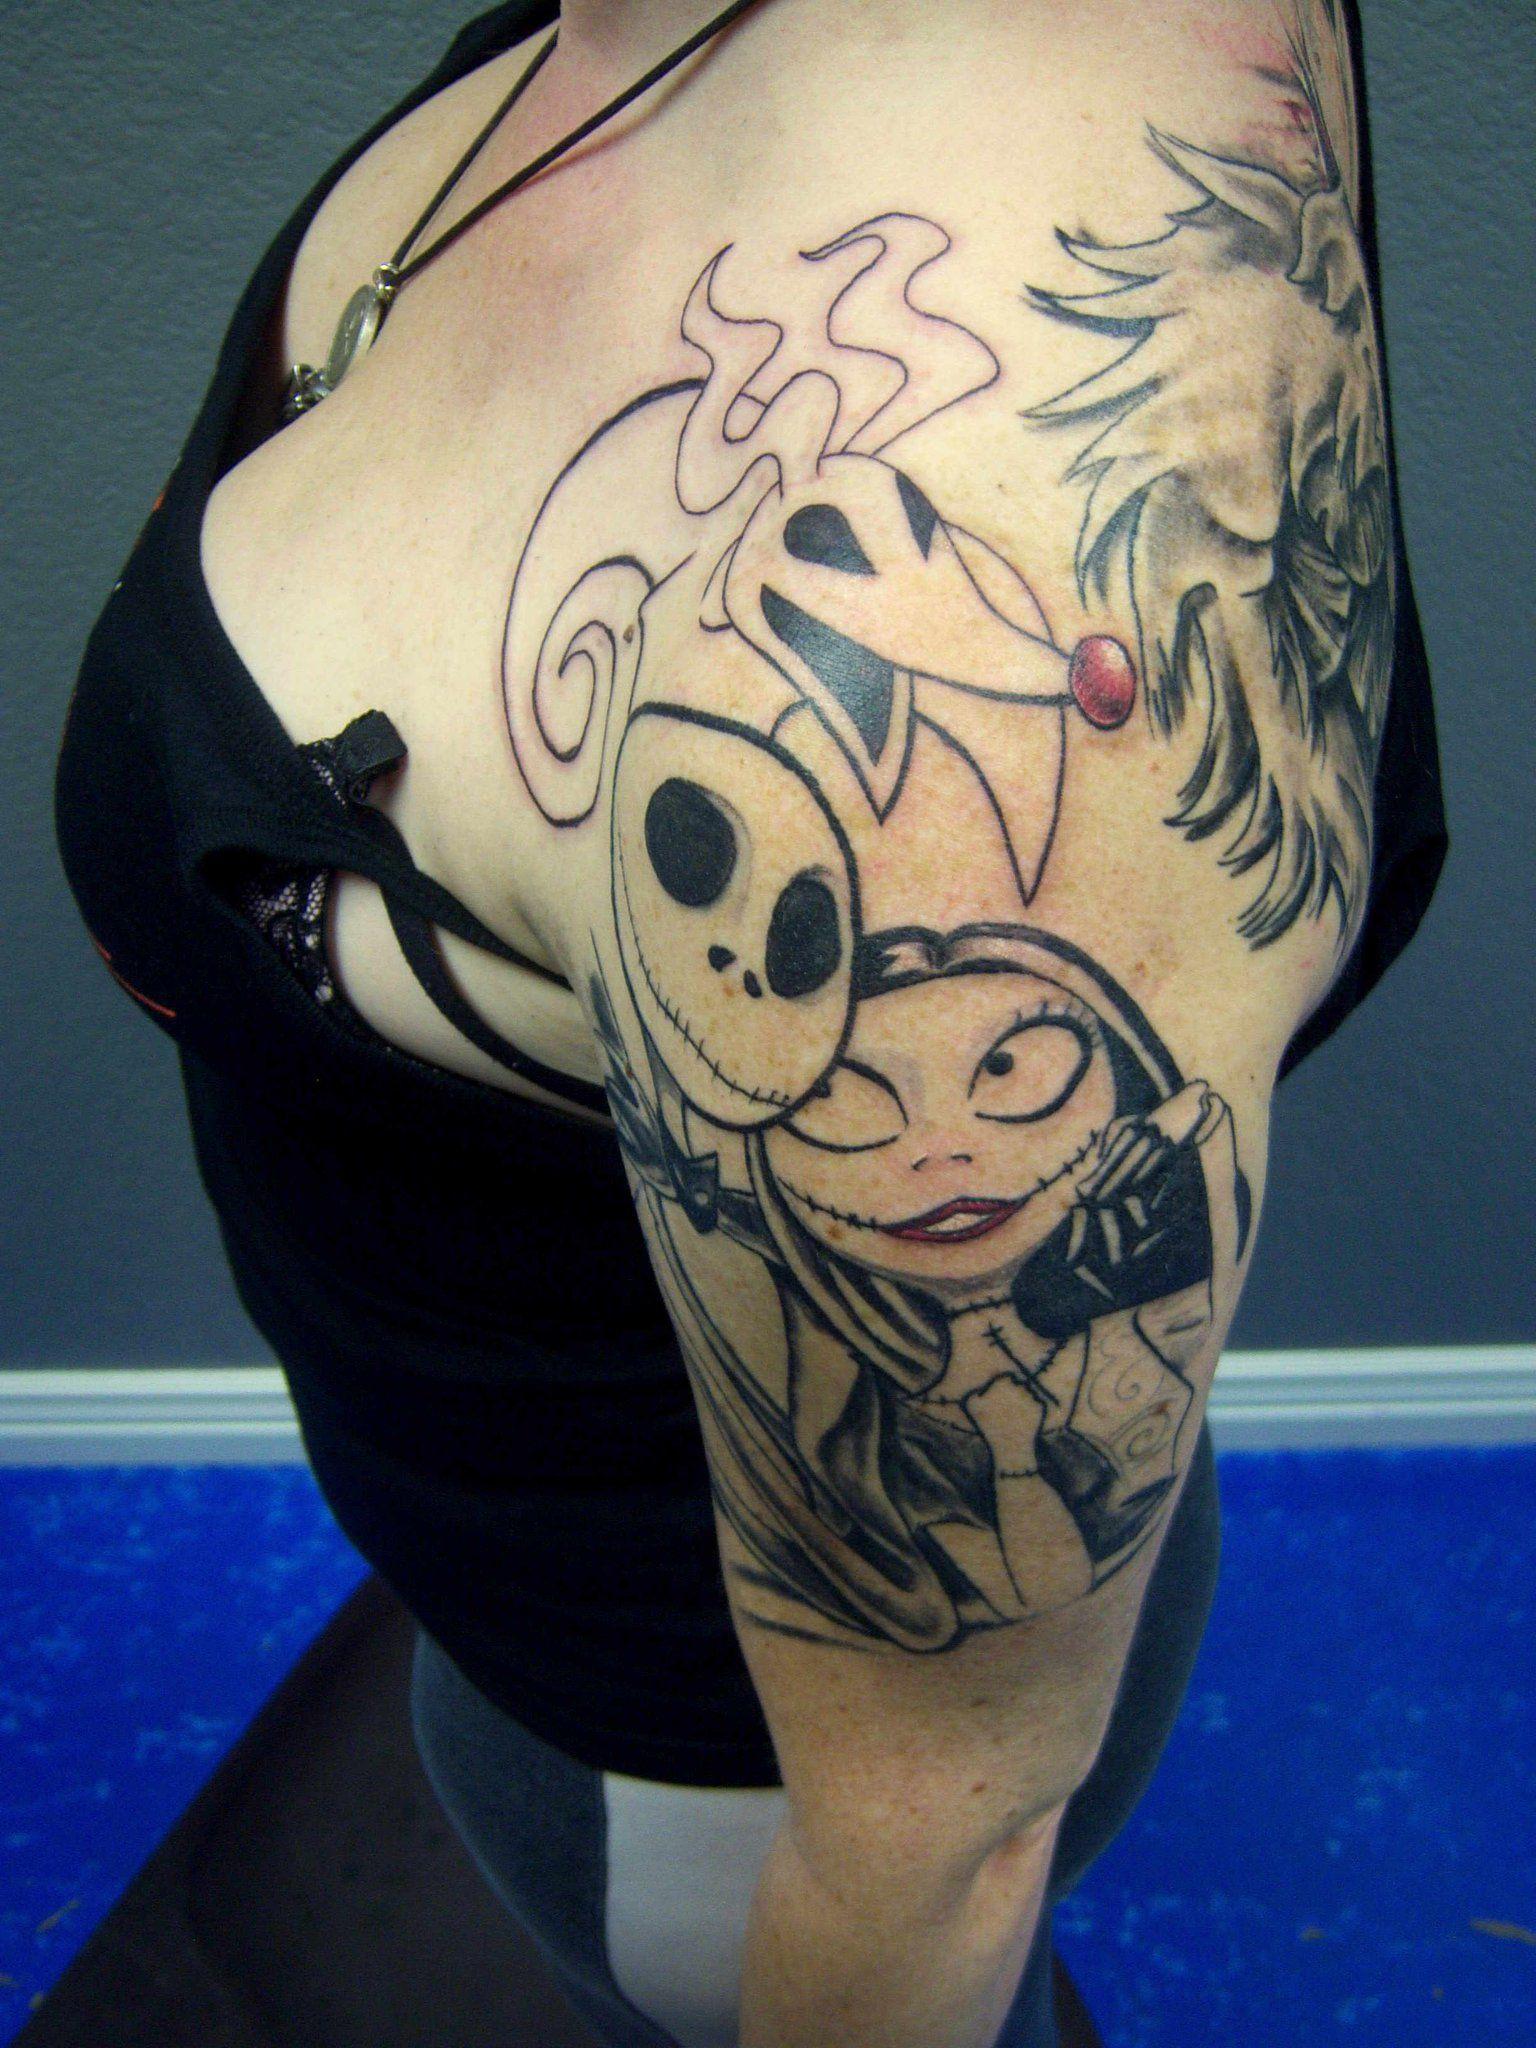 Jack Sally and Zero done by John Hansen love this tattoo